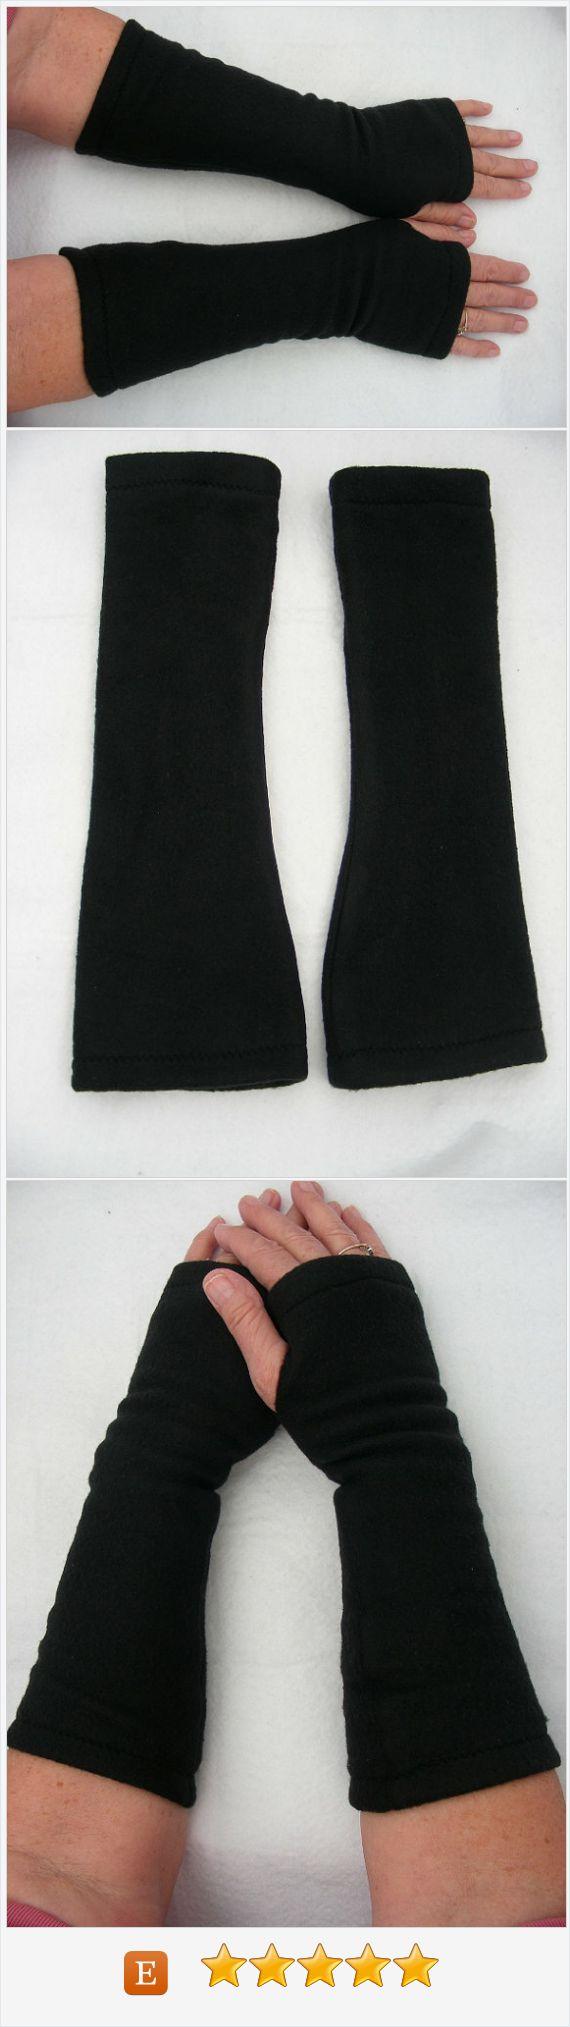 Driving texting gloves - Black Fleece Fingerless Gloves Black Arm Warmers Fleece Gloves Texting Gloves Cycling